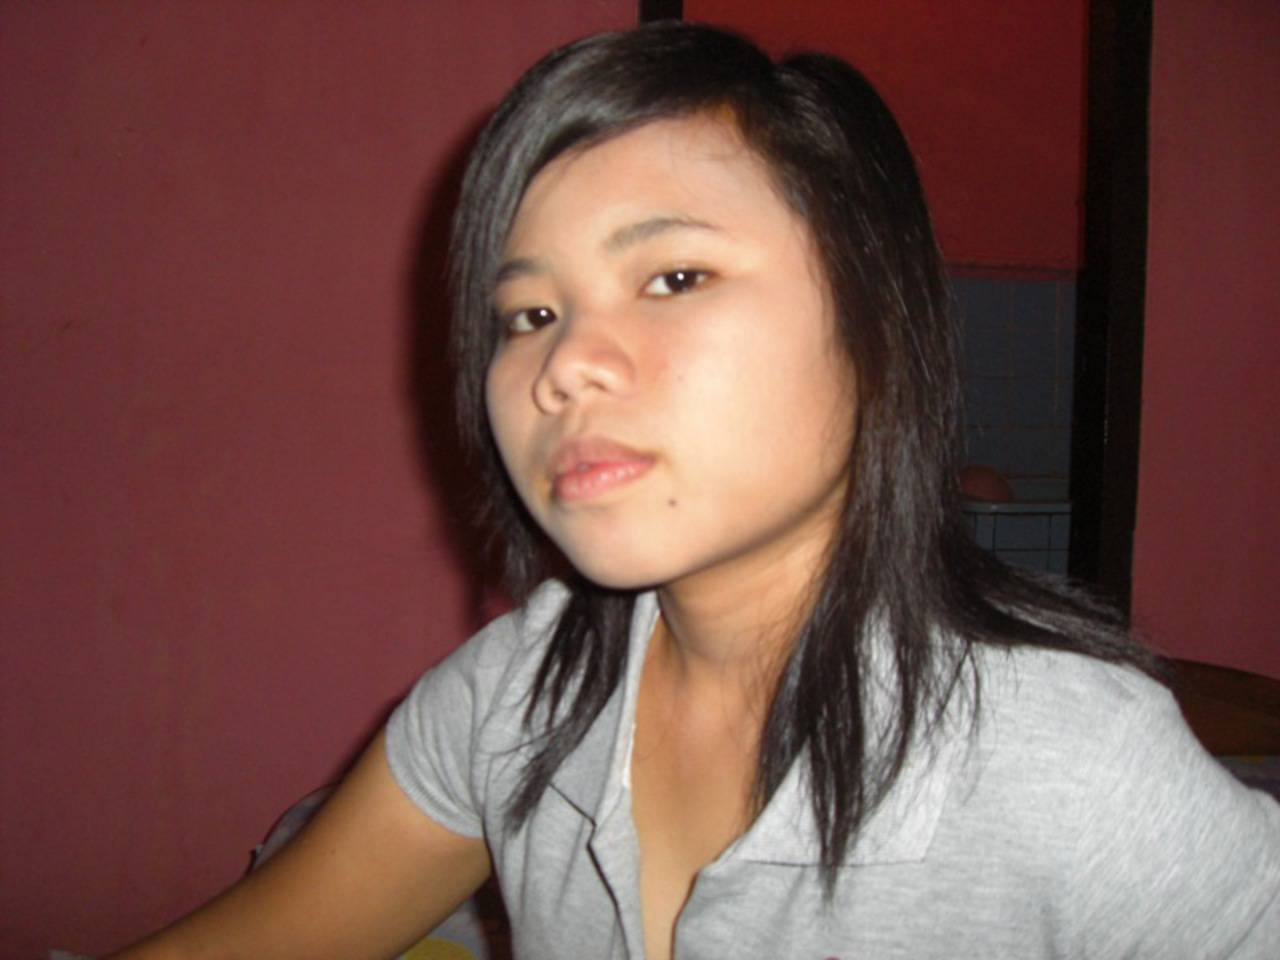 xxx desi college girl